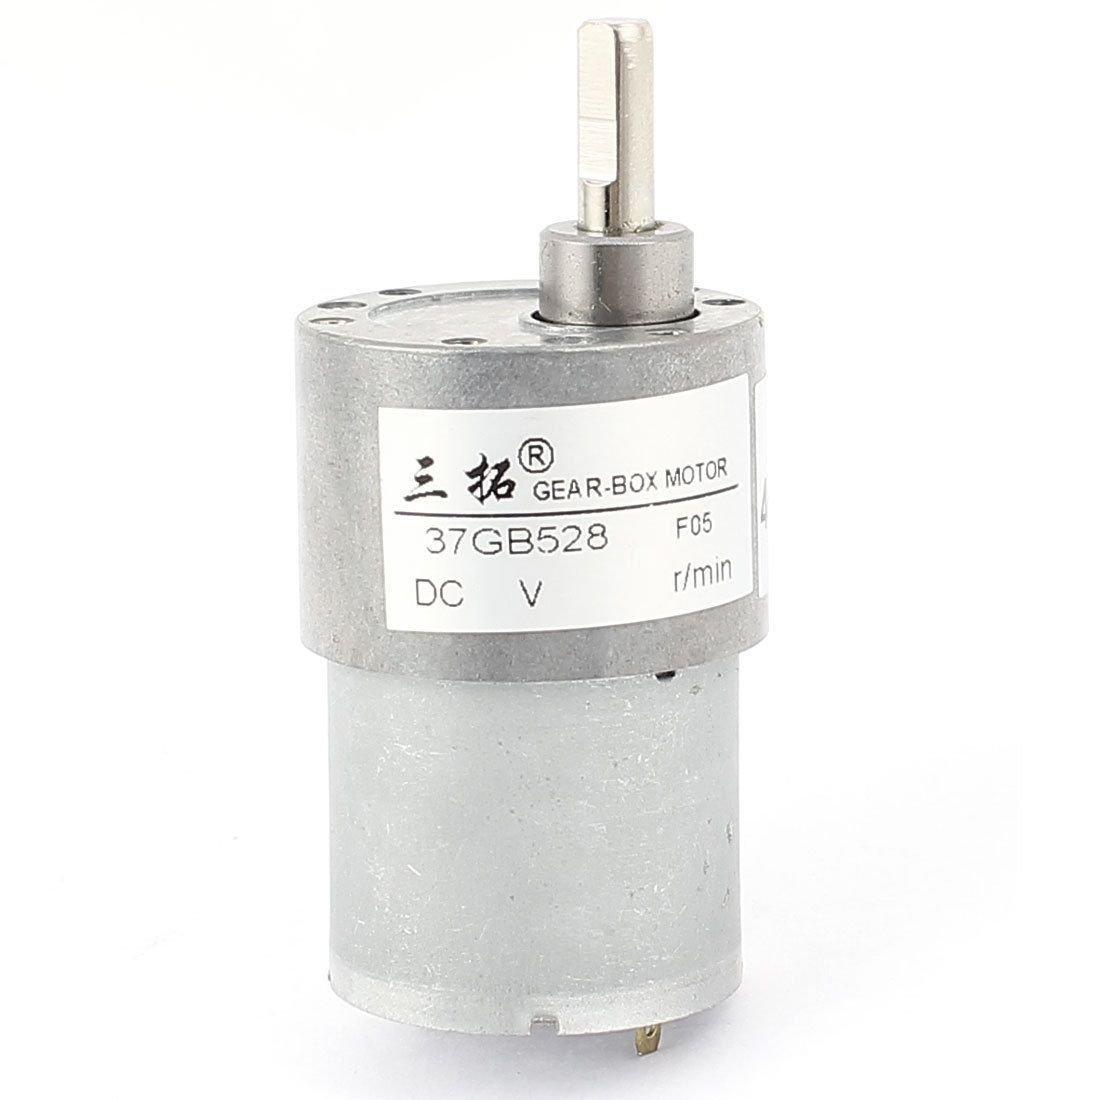 DC 24V 34RPM 0.15A 3.6KG.cm High Torque DC Gear Box Reducer Variable Speed Motor